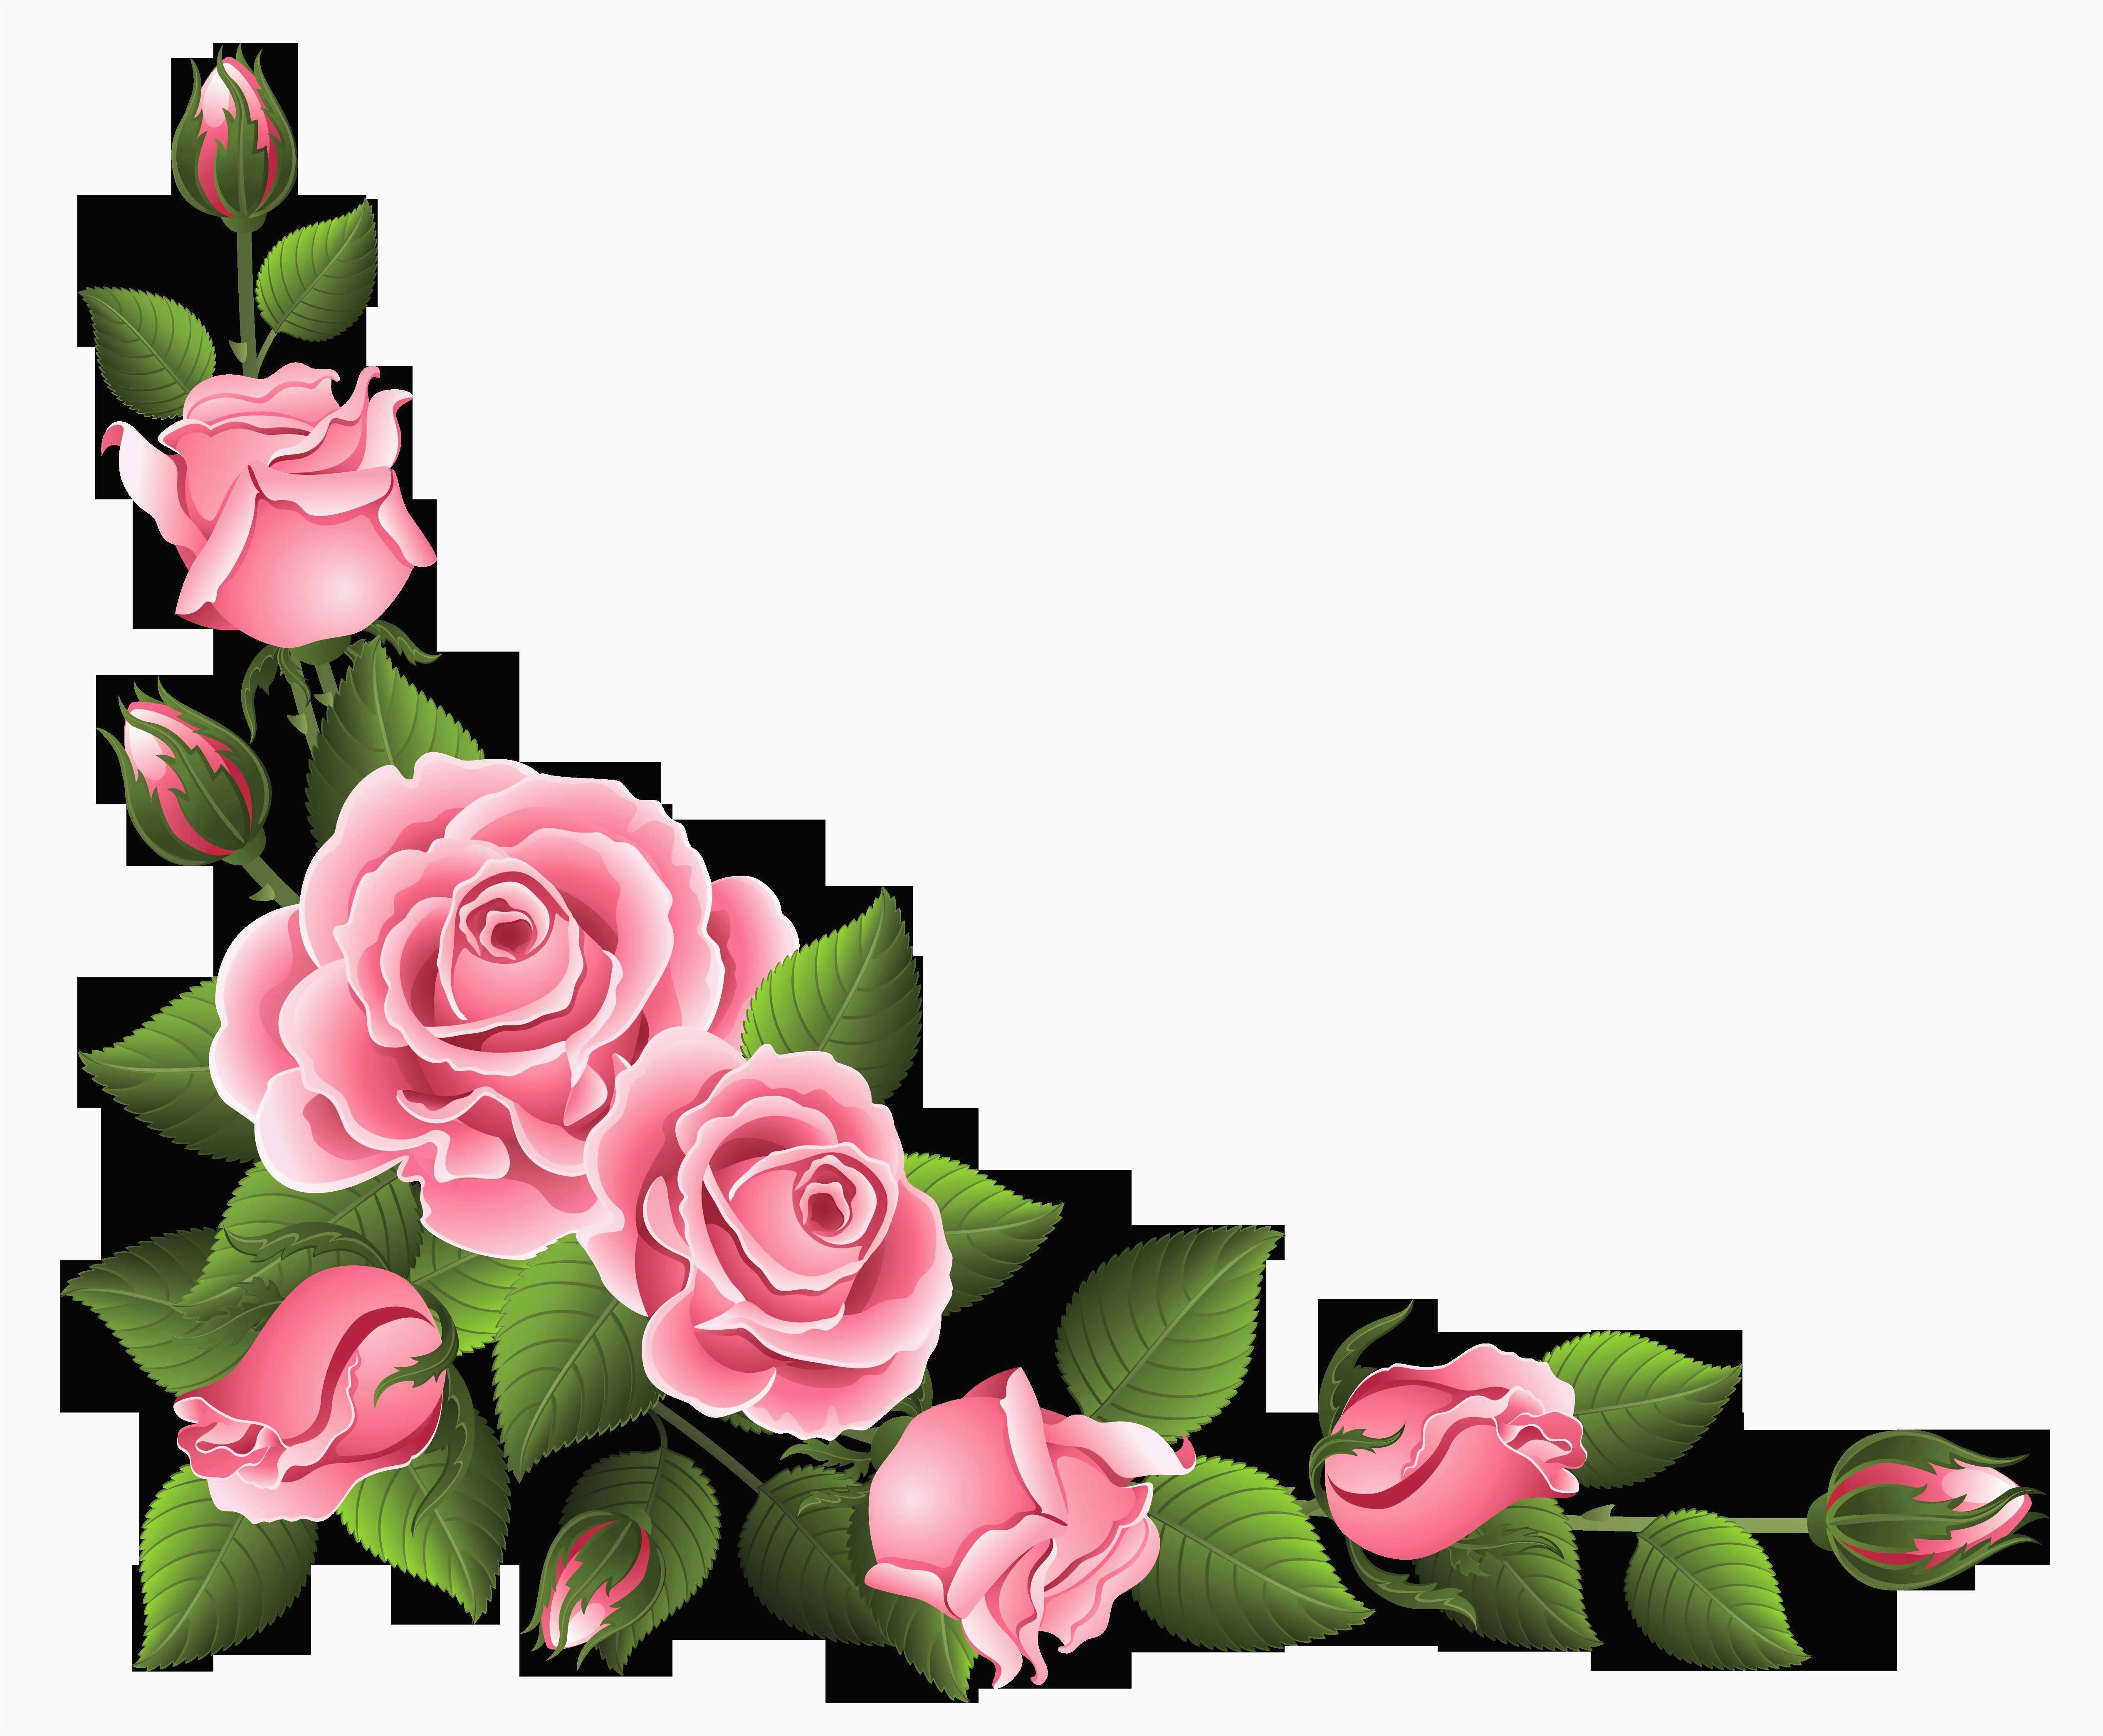 Contemporary Decorative Vases Of Flower Clipart Review Bodenvase Deko Neu Flower Vase Table 04h Vases Regarding Flower Clipart Latest Bodenvase Deko Neu Flower Vase Table 04h Vases Tablei 0d Clipart 2zy Trending